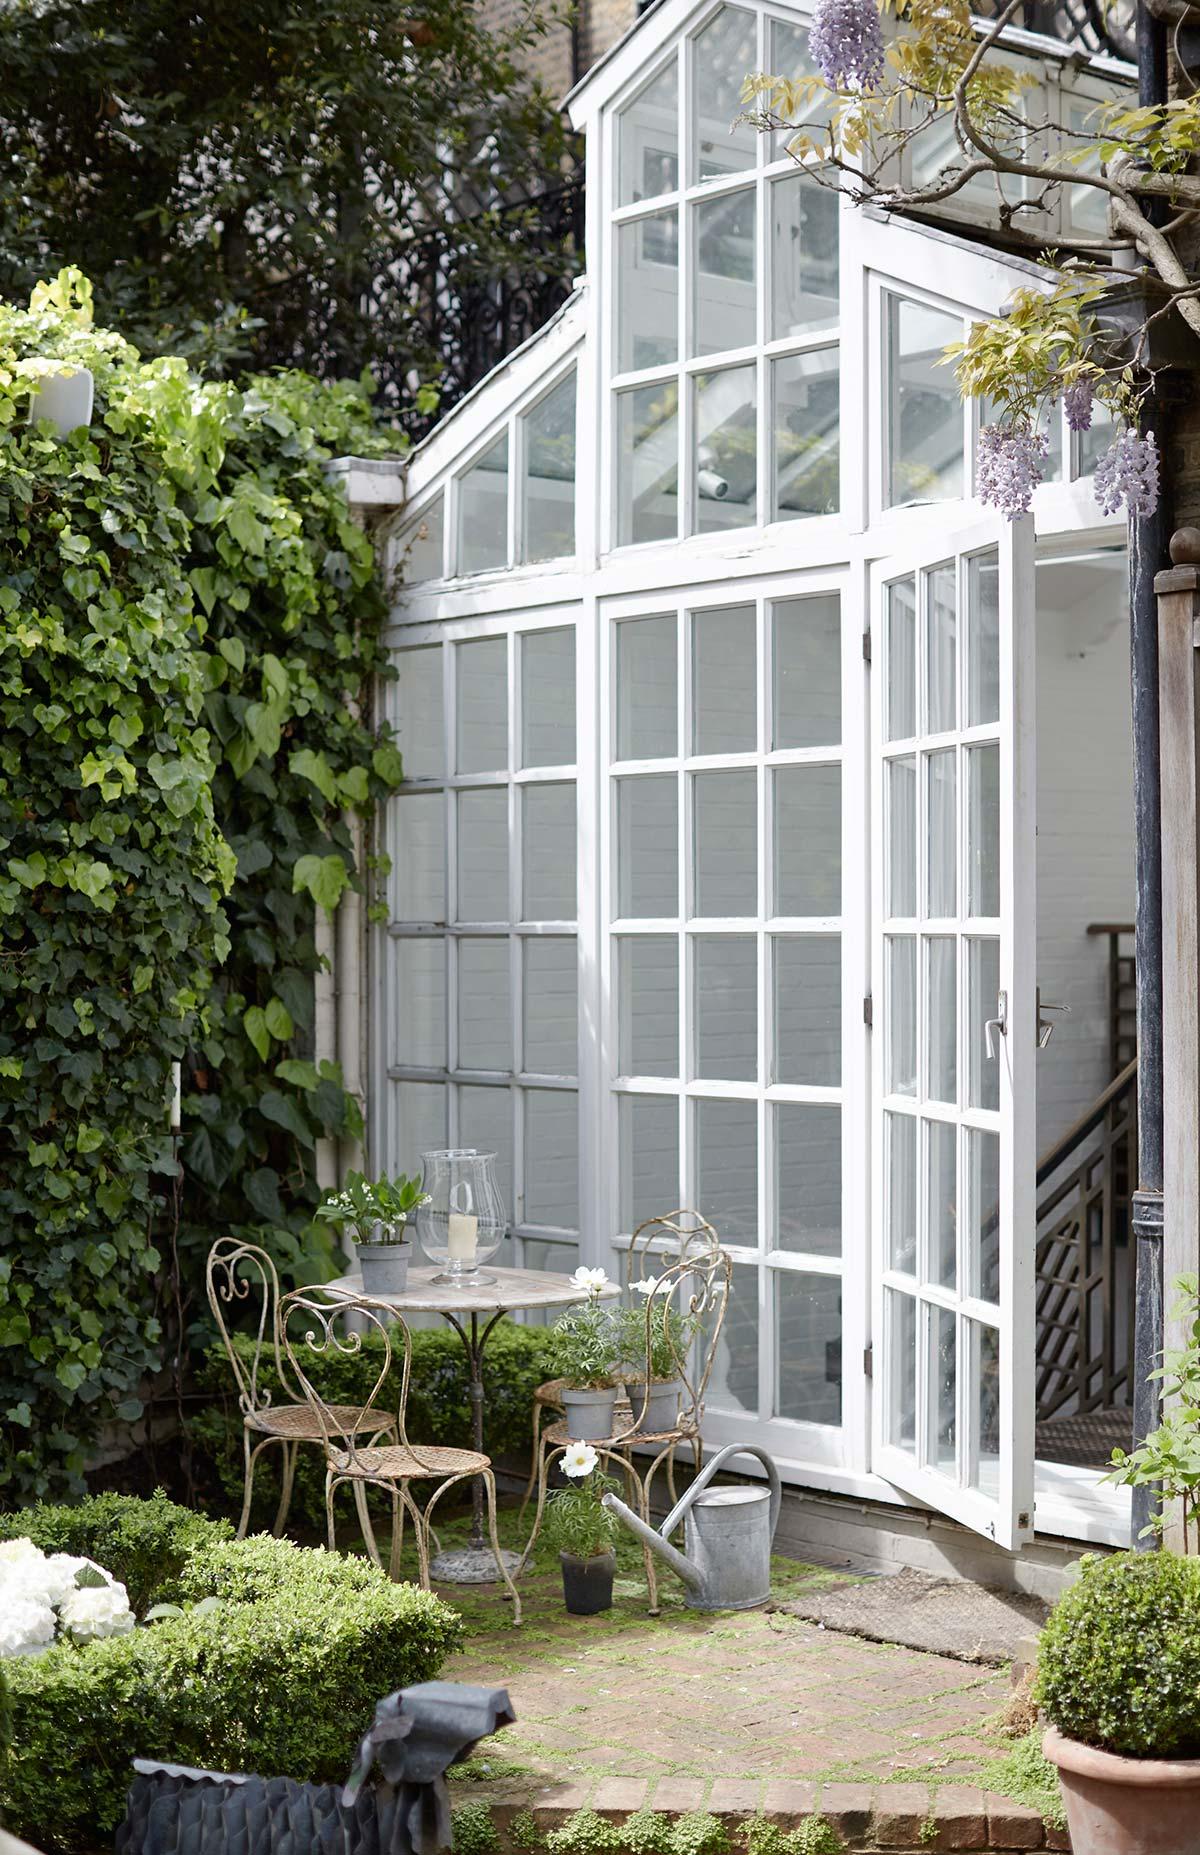 Green House by Officine Gullo. Progetto di Alison Henry